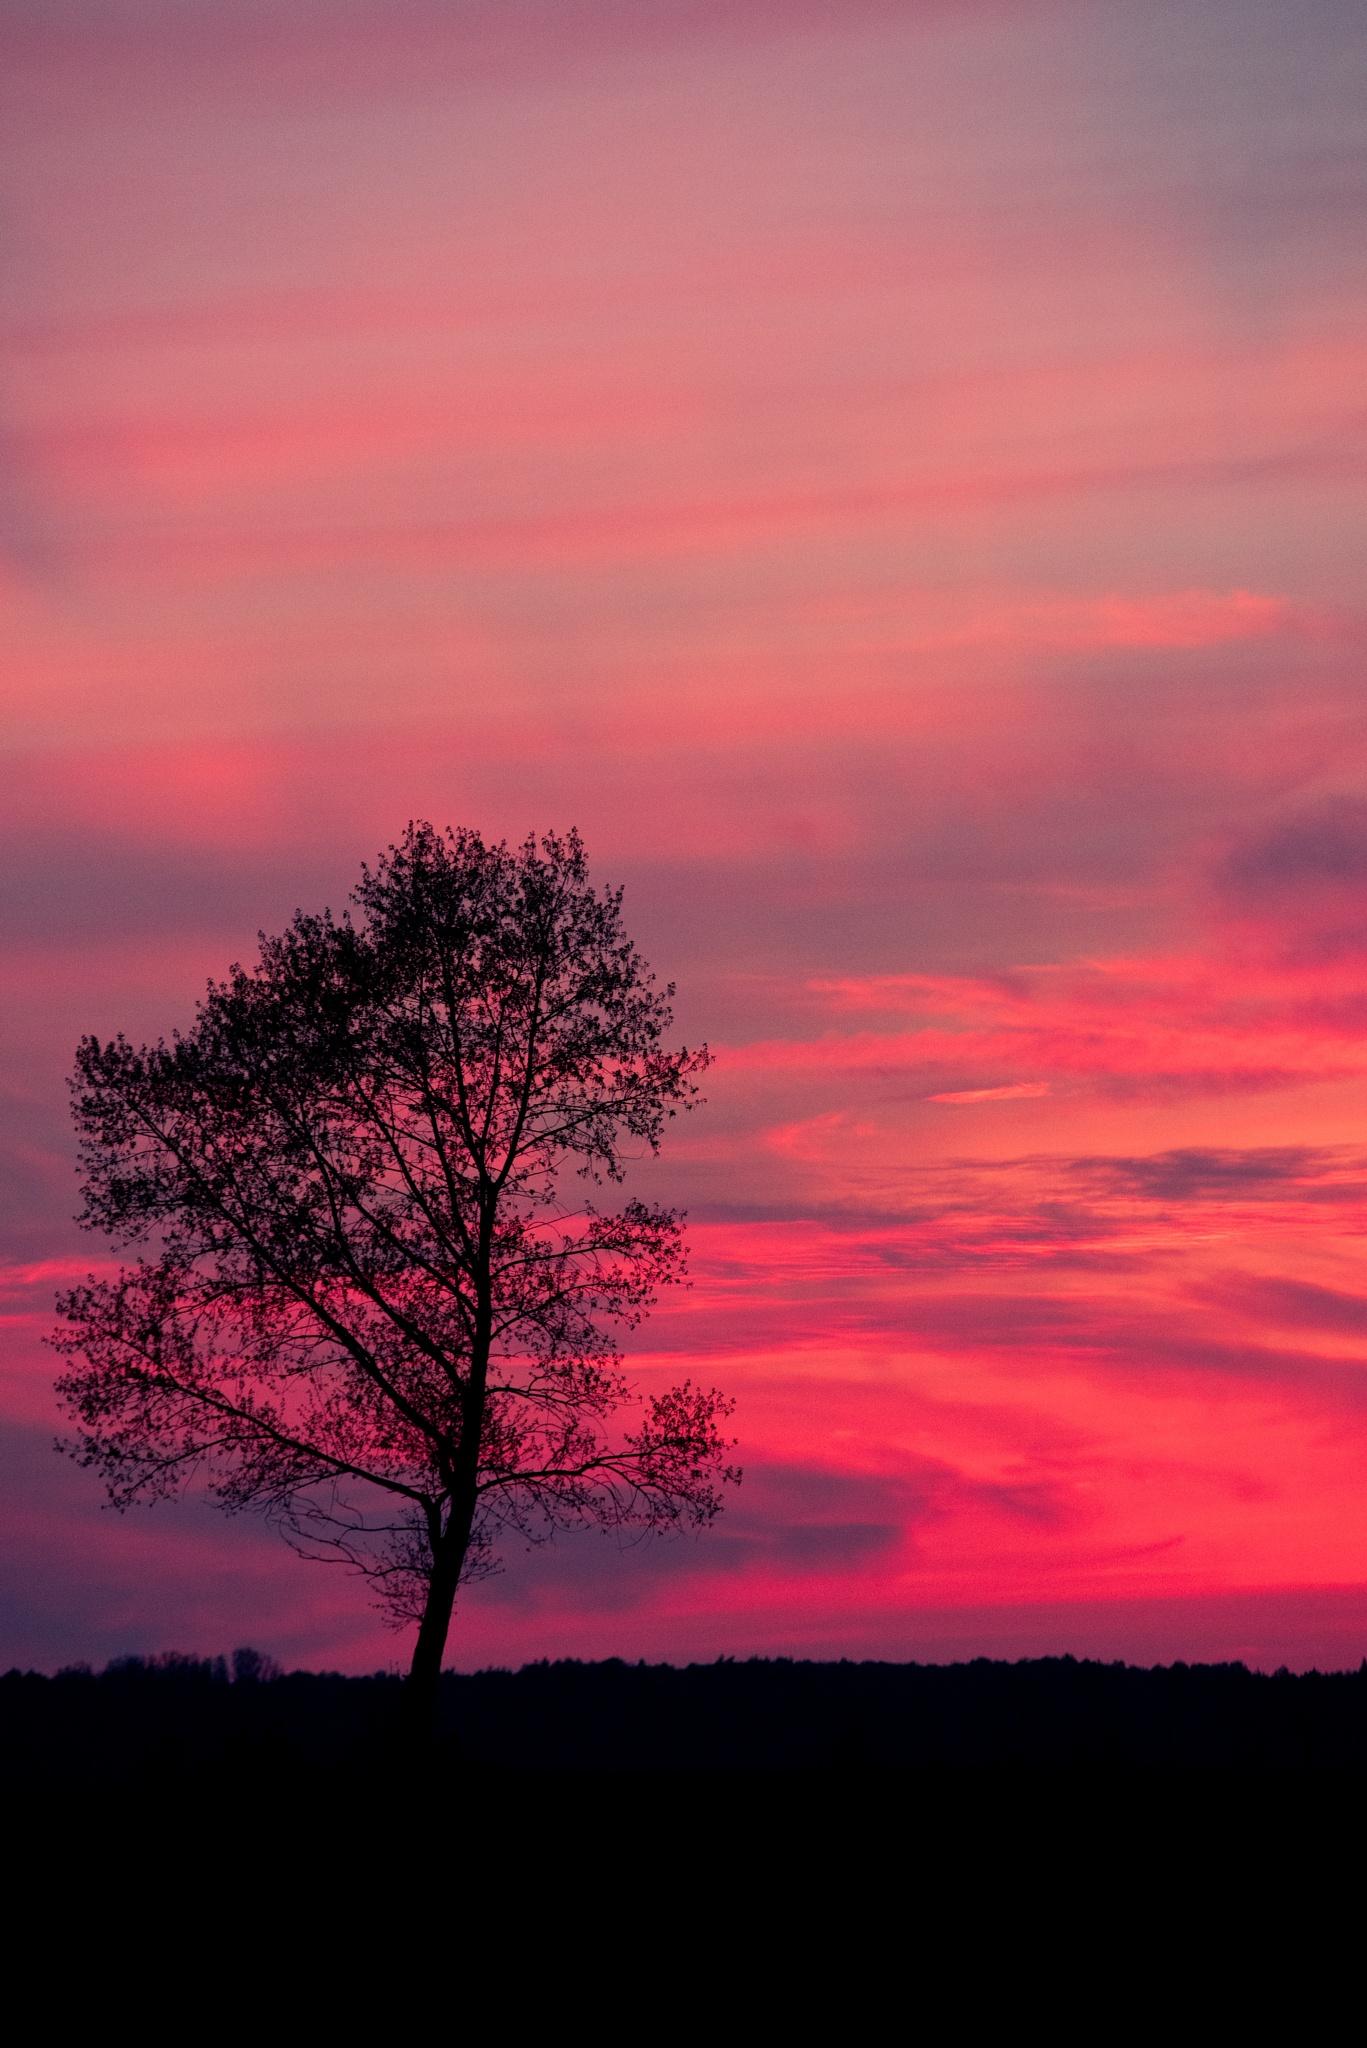 Pink sunset by Projektfoto